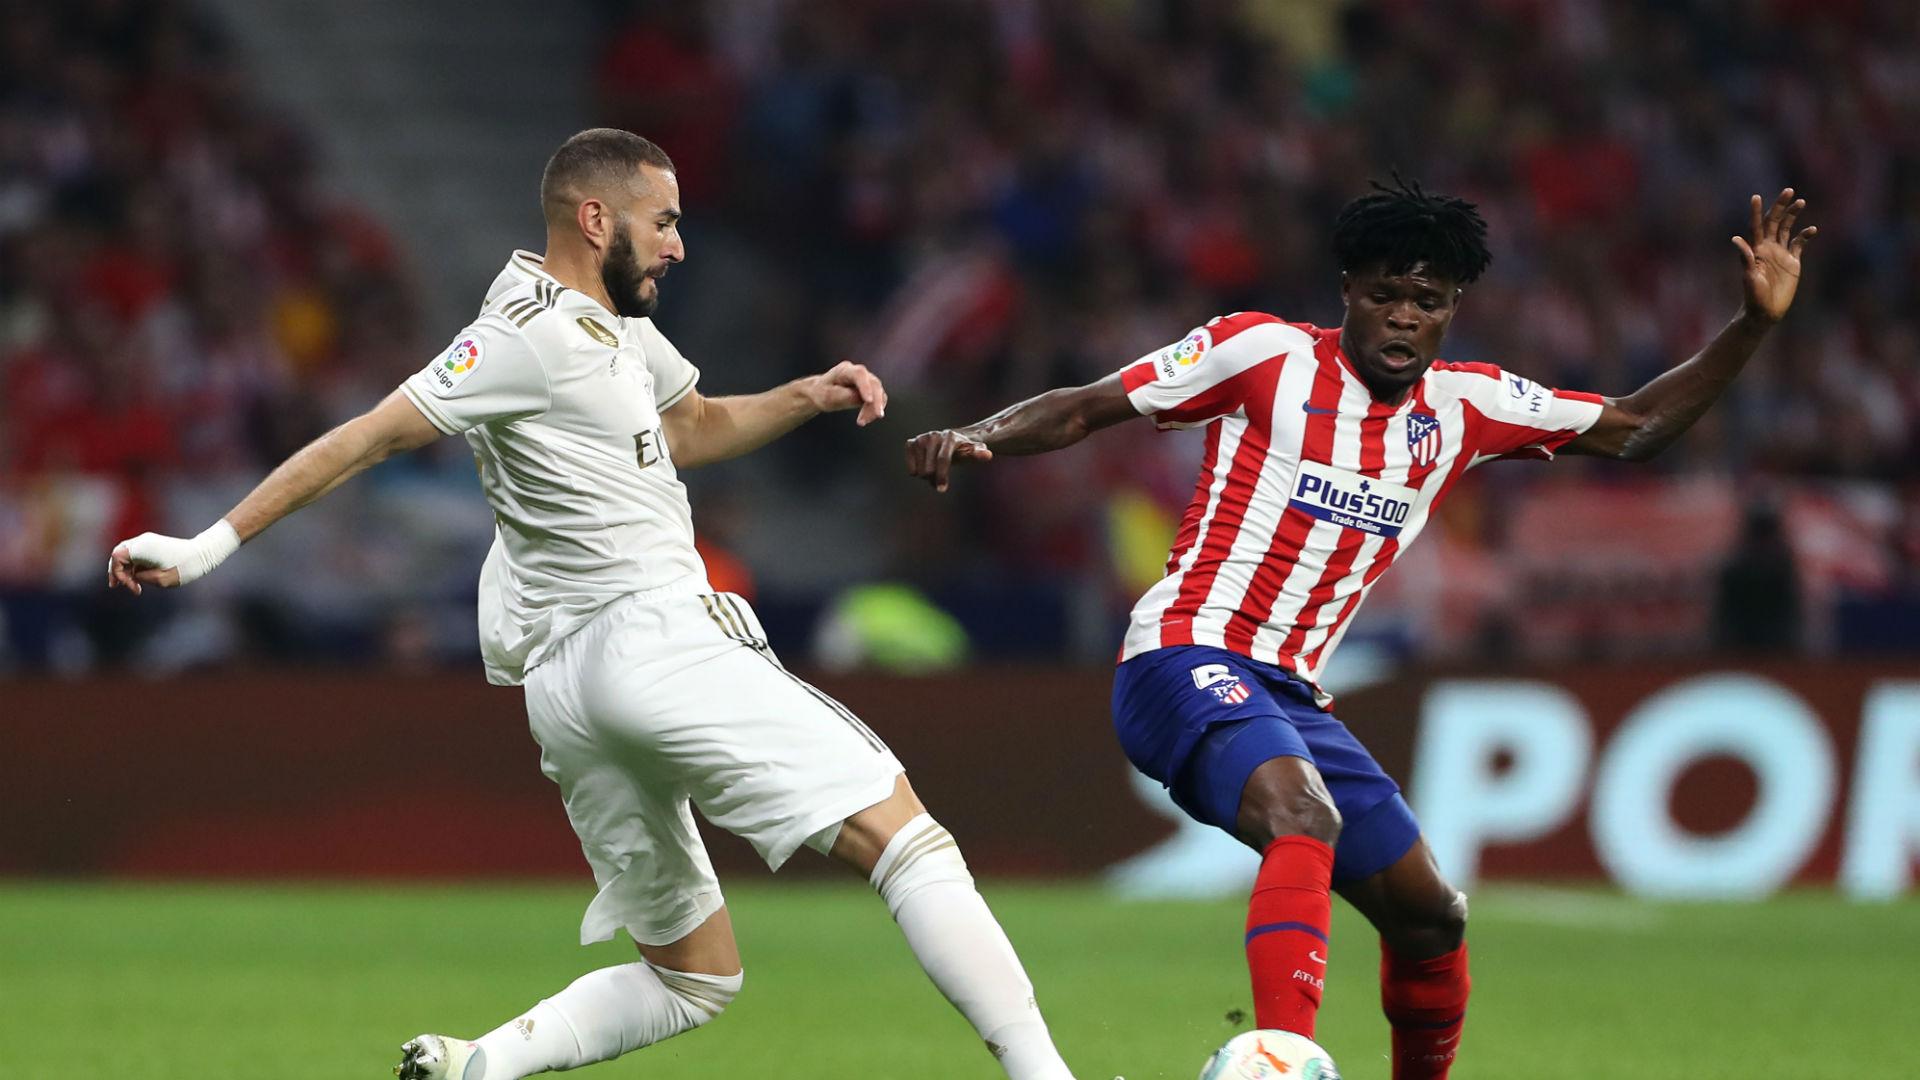 Thomas Partey Atletico Madrid 2019-20